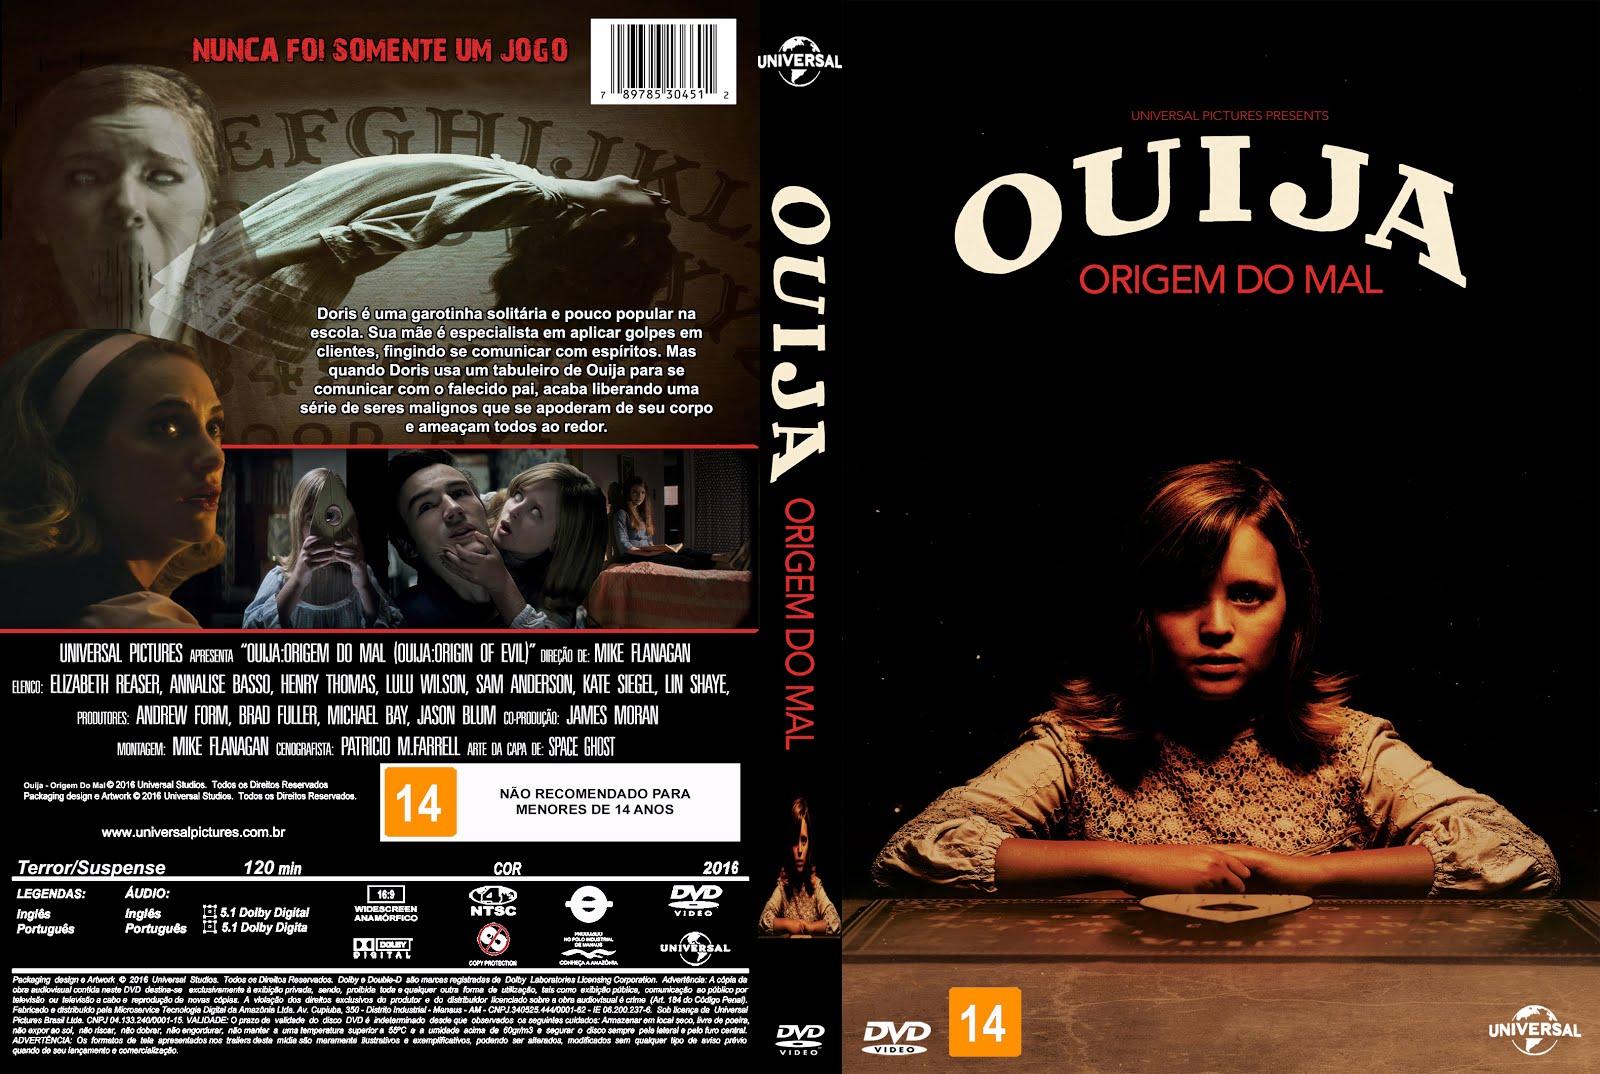 Capa DVD Ouija Origem Do Mal